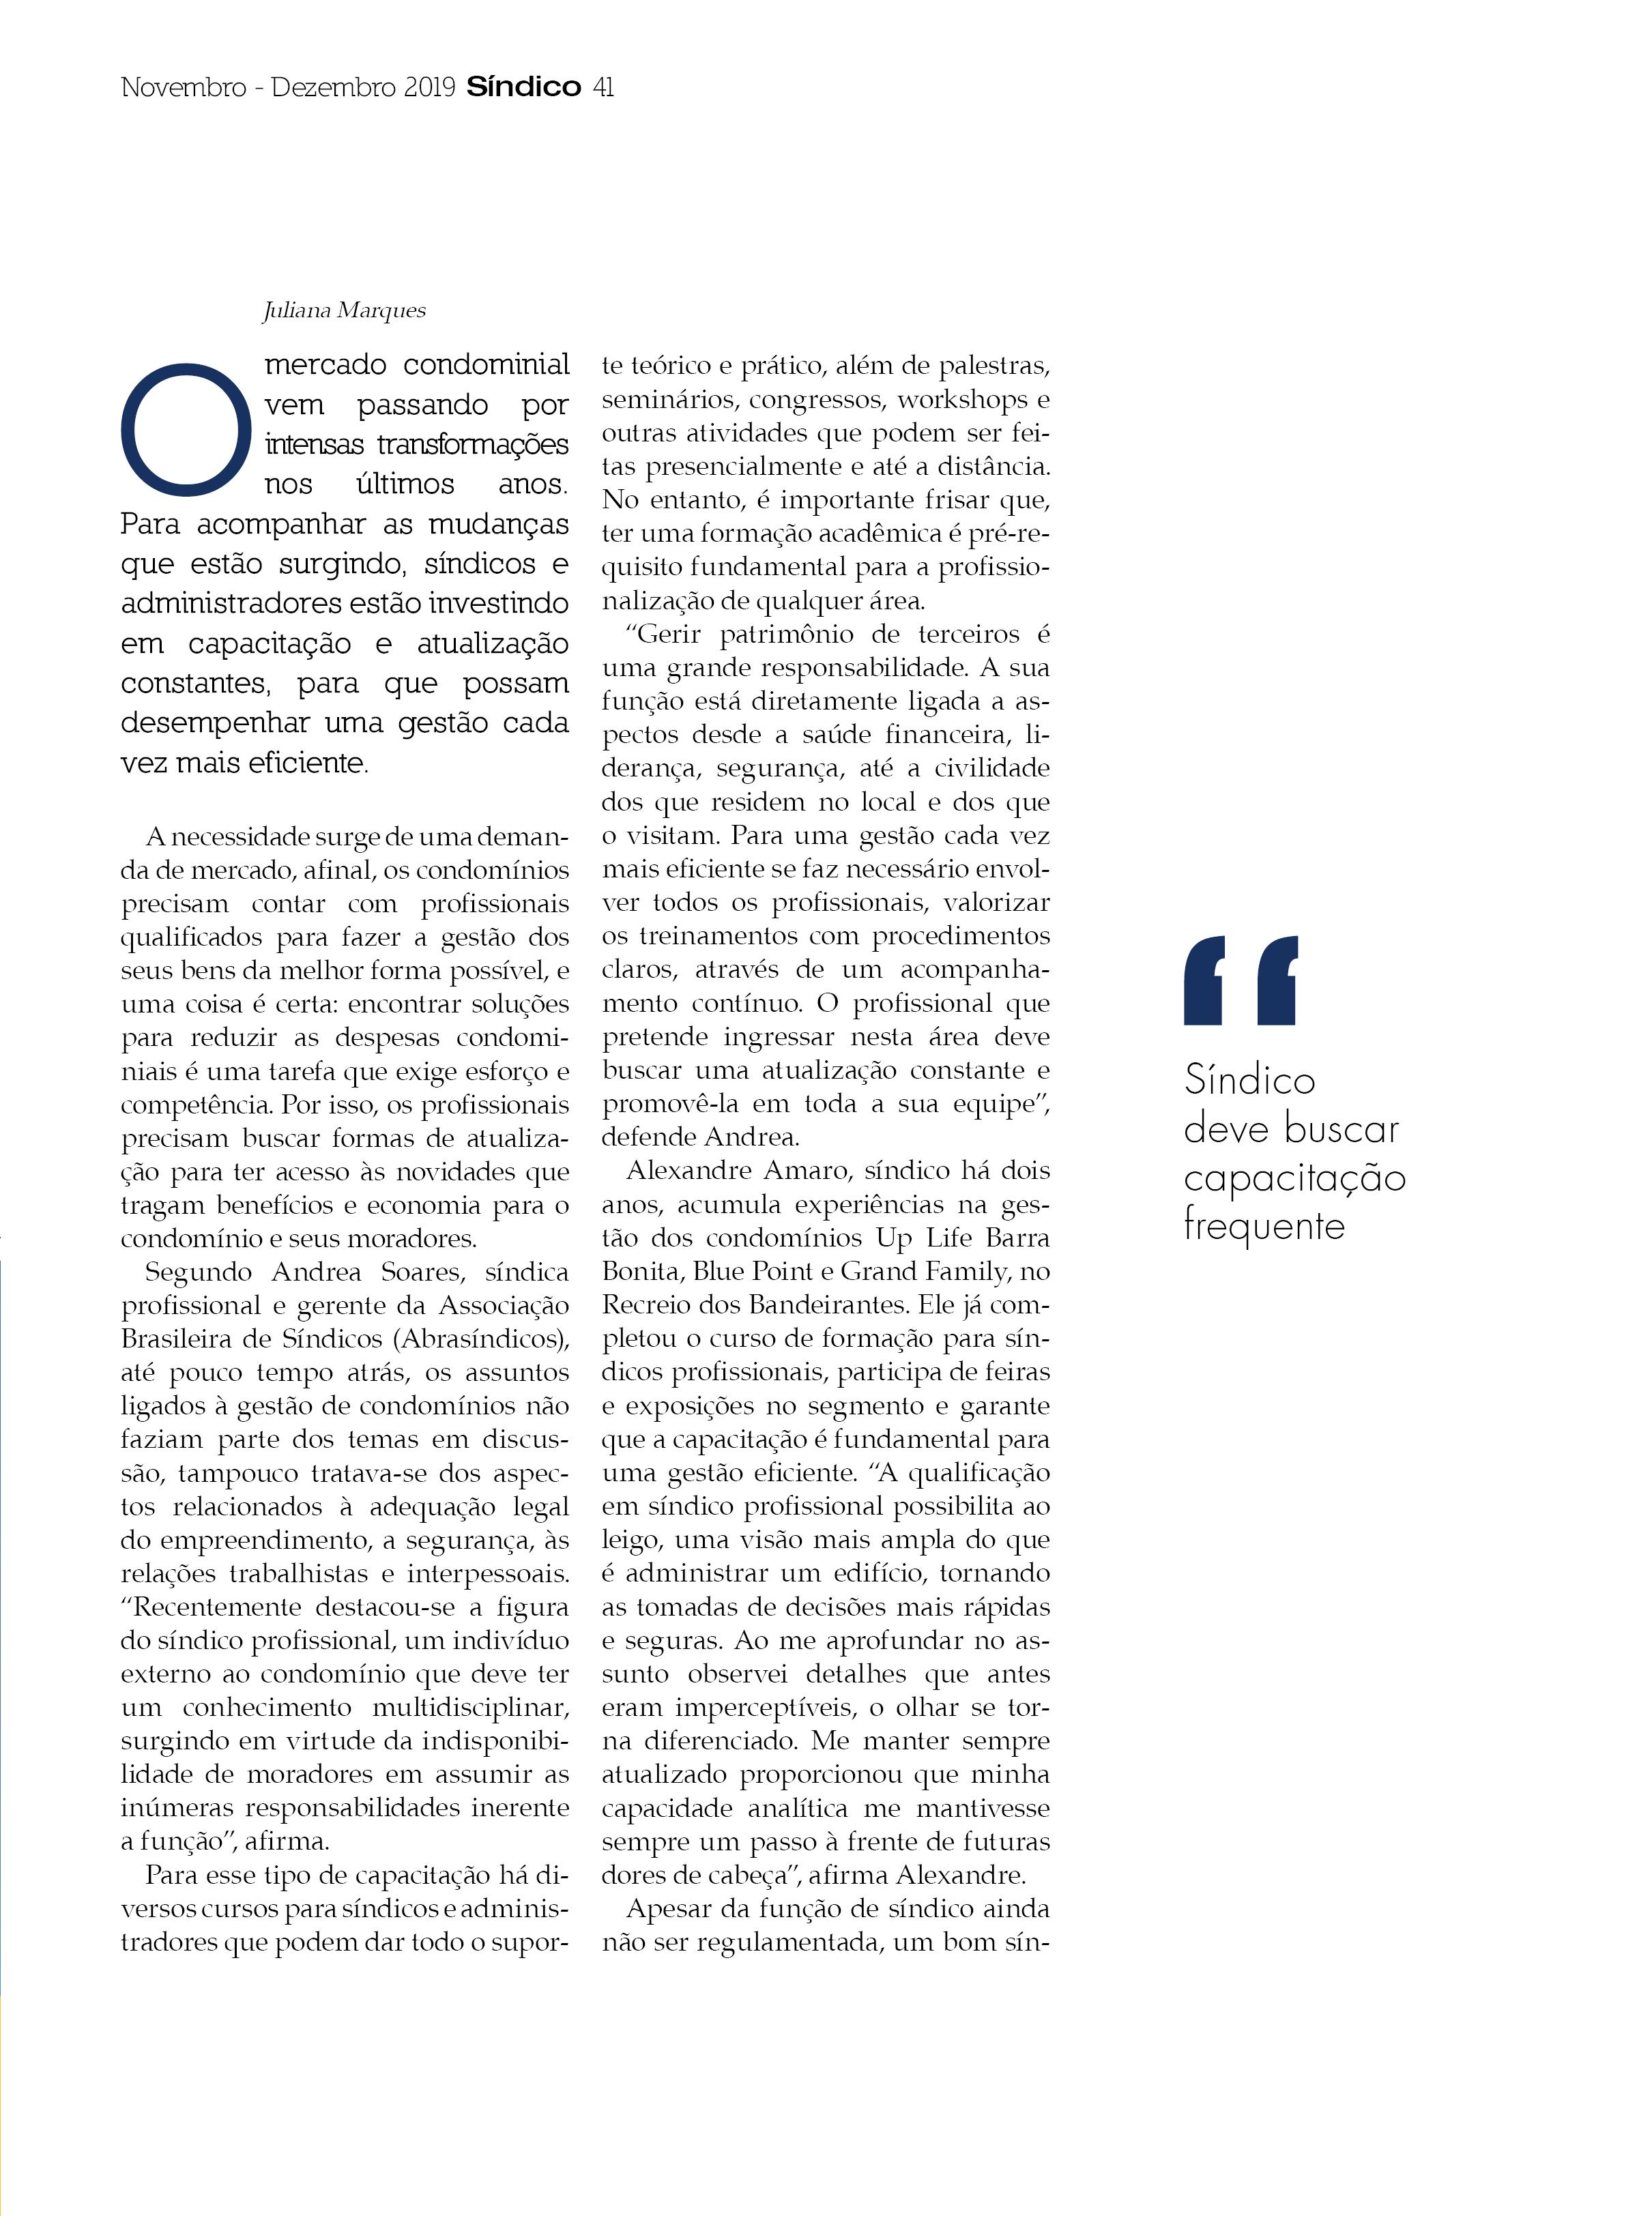 Revista Síndico_ed 247_39